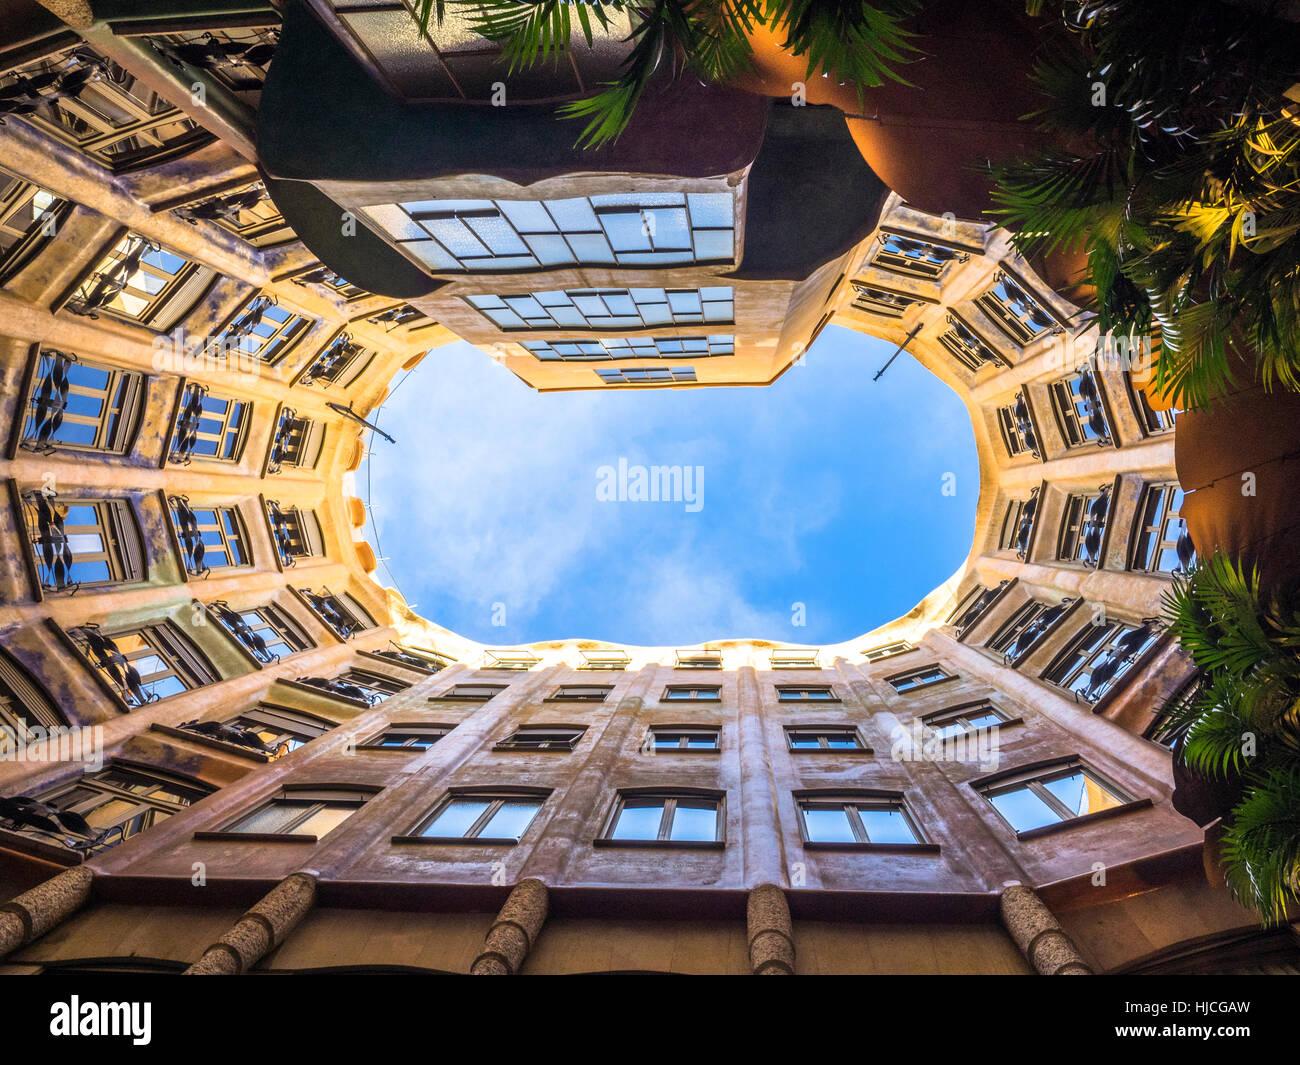 Casa Milá known as La Pedrera - Barcelona, Spain. - Stock Image